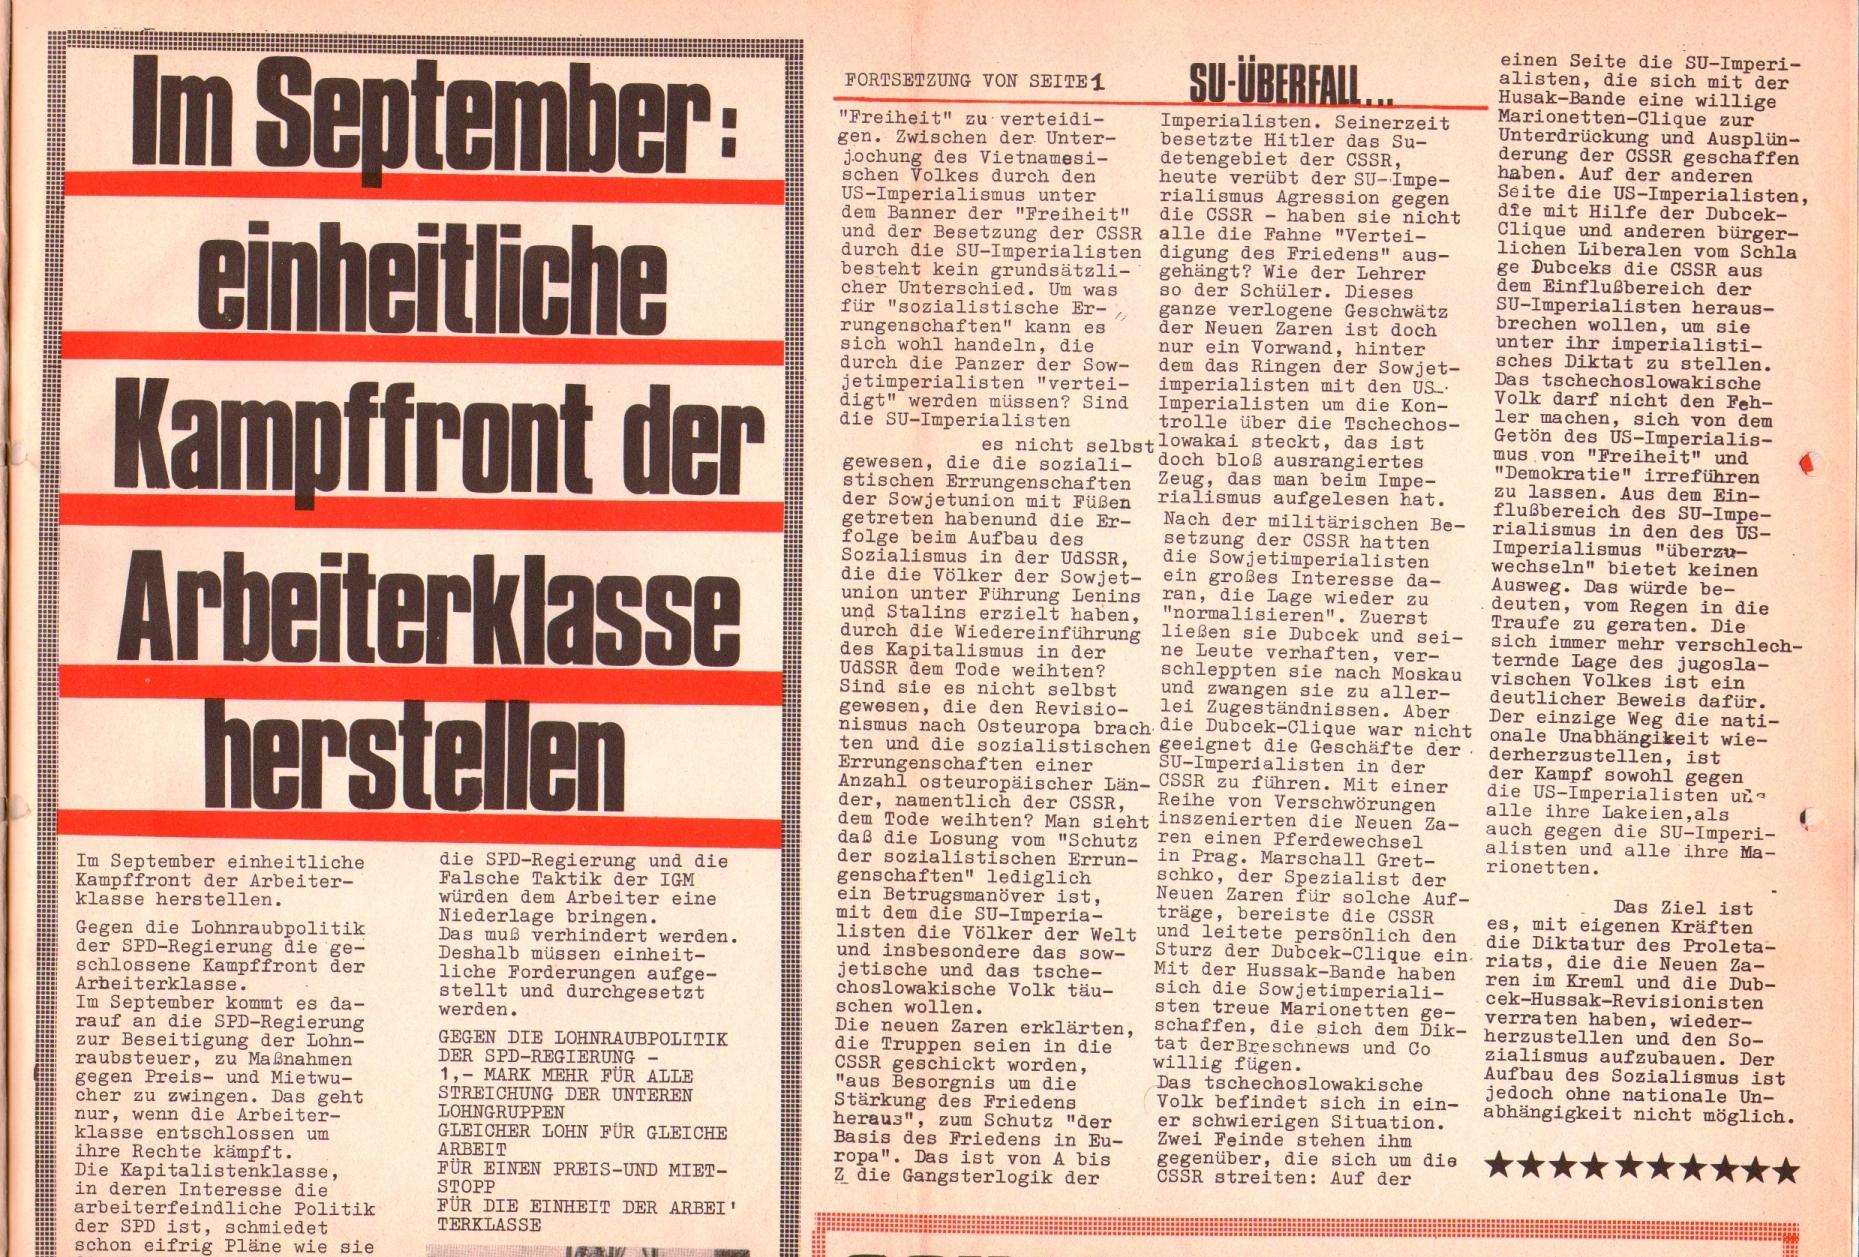 Rote Fahne, 1. Jg., 26. August 1970, Seite 3 oben